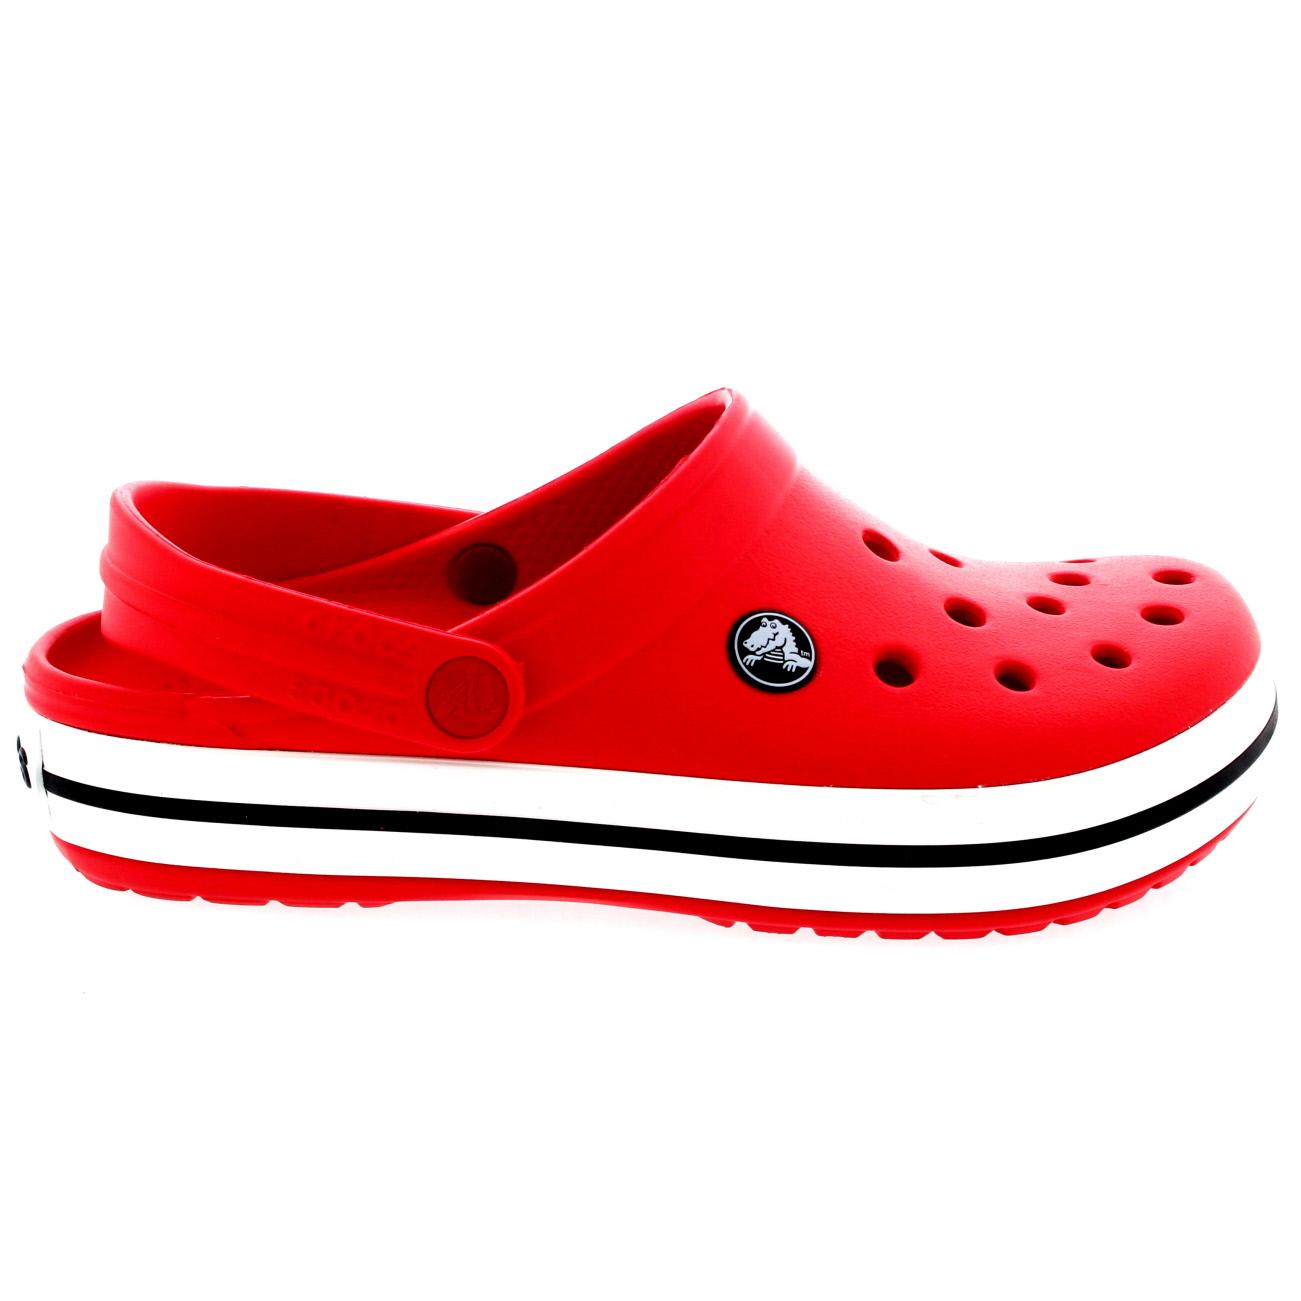 Crocs Clog Sandals Women S Shoes